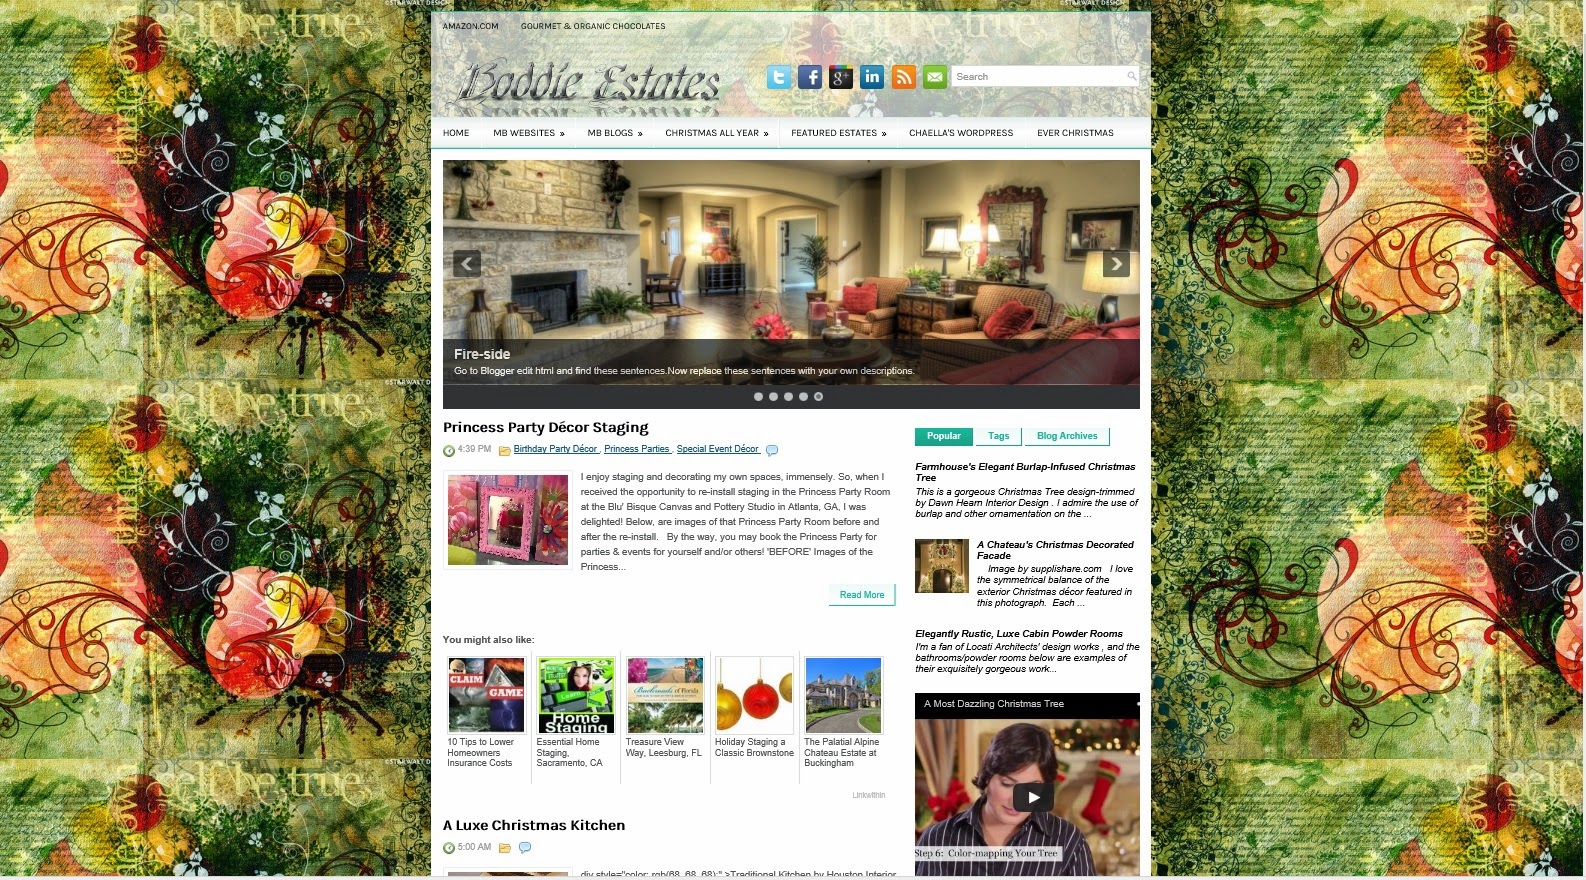 Boddie Estates Real Estate Topics blog